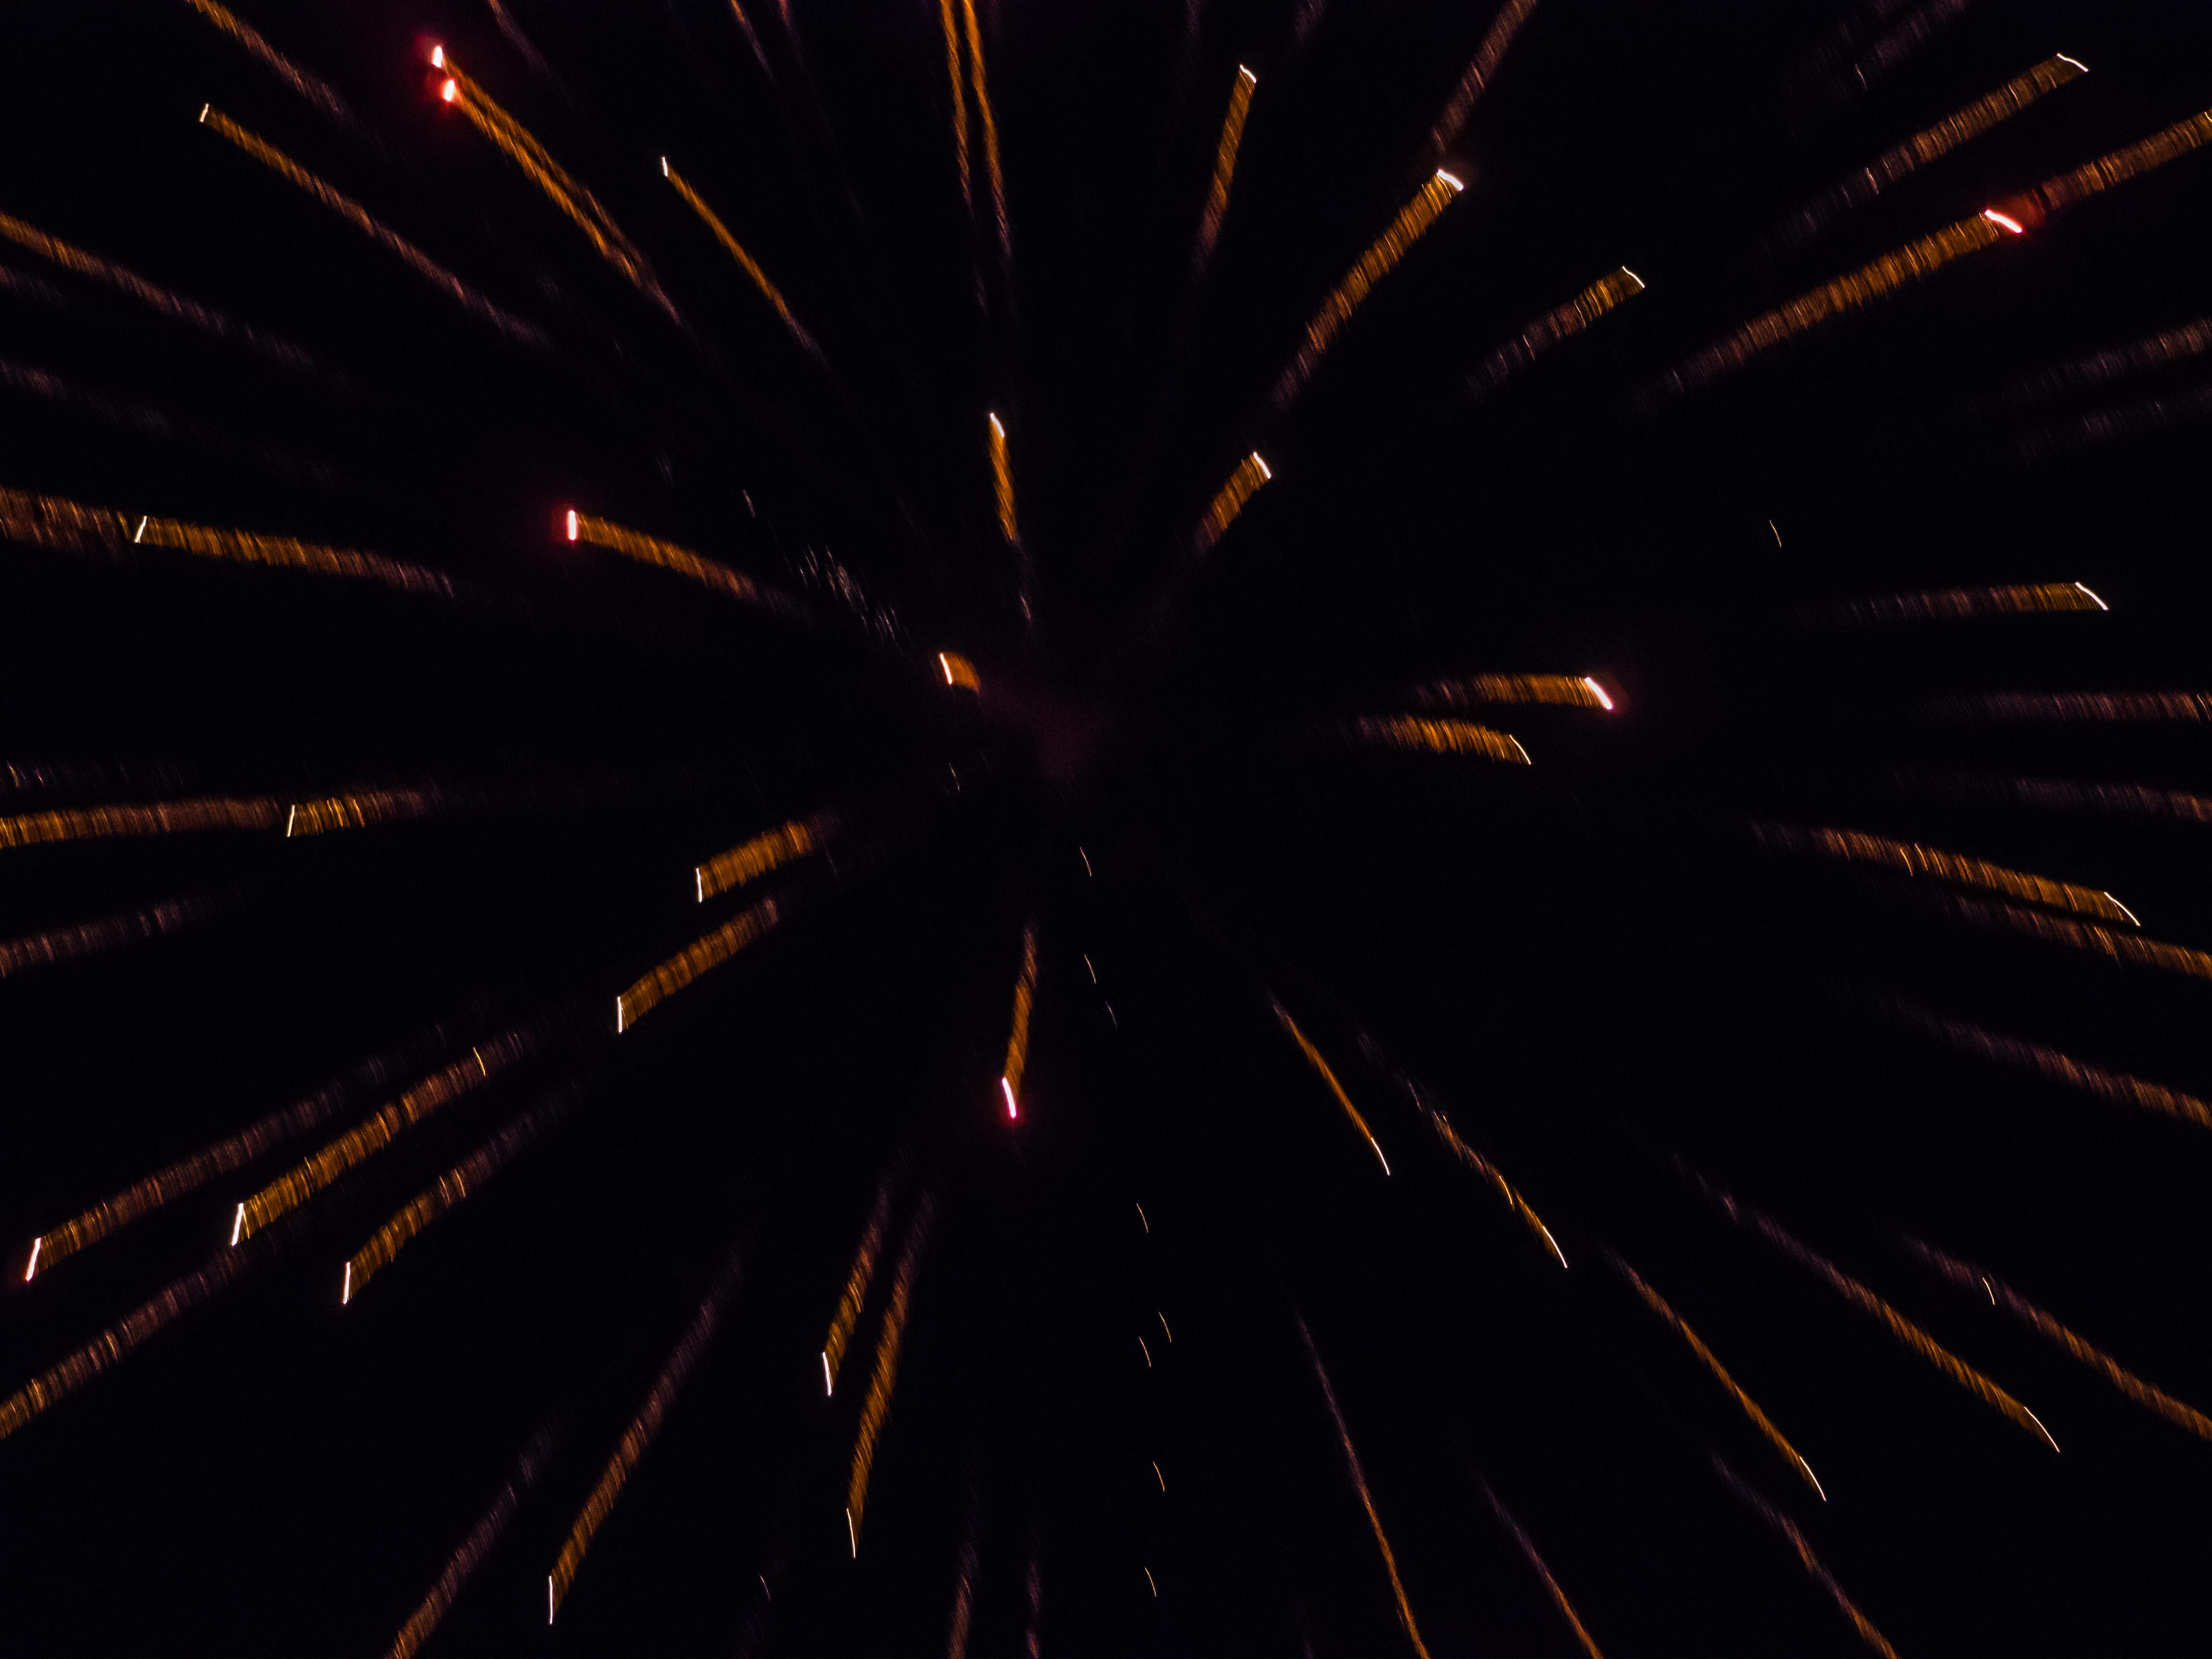 St cyprien pre bastille day fireworks at garrit-france-em10-20150713-p7130308.jpg photo